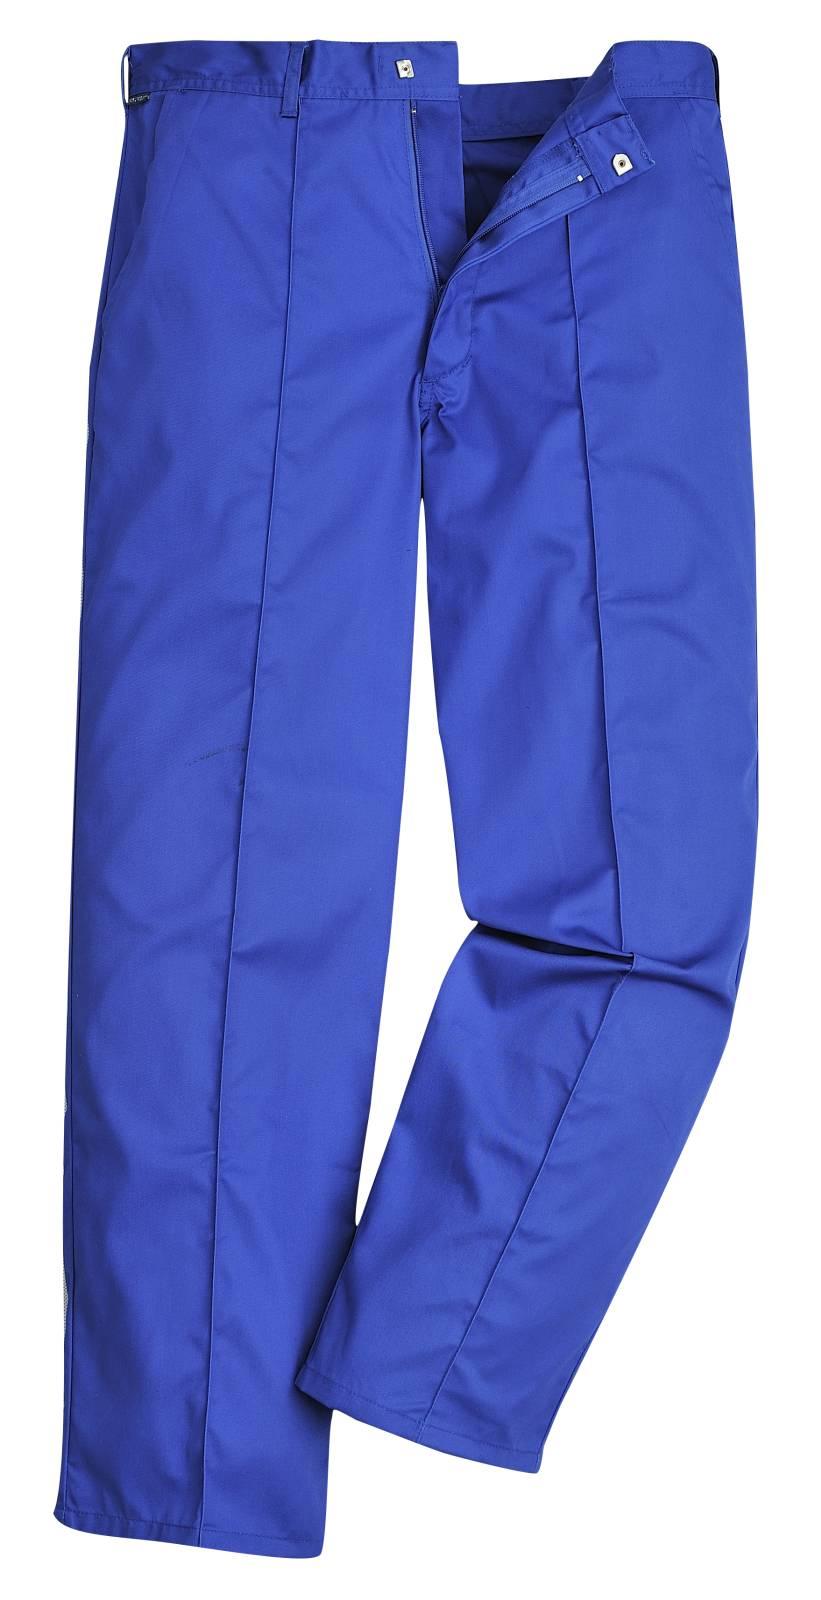 Portwest Broeken 2885 UPF50+ UV koningsblauw(RB)